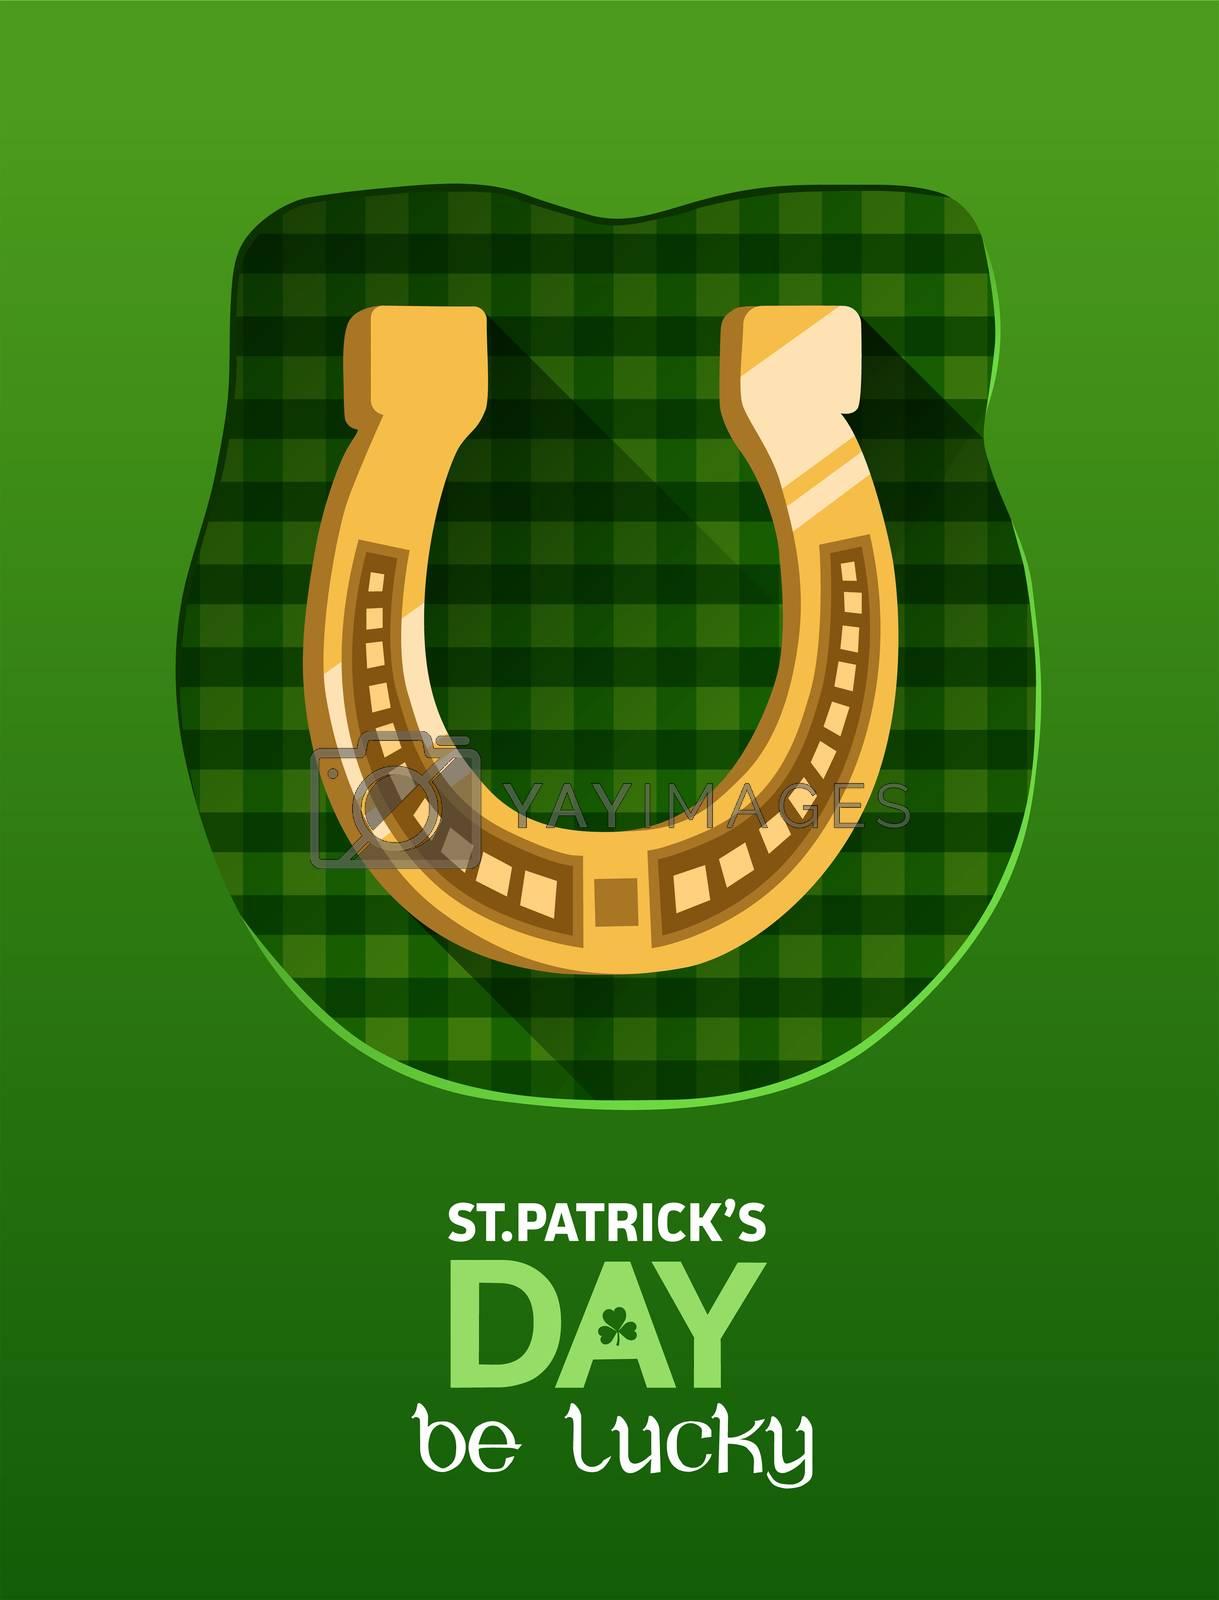 Digitally generated St patricks day vector